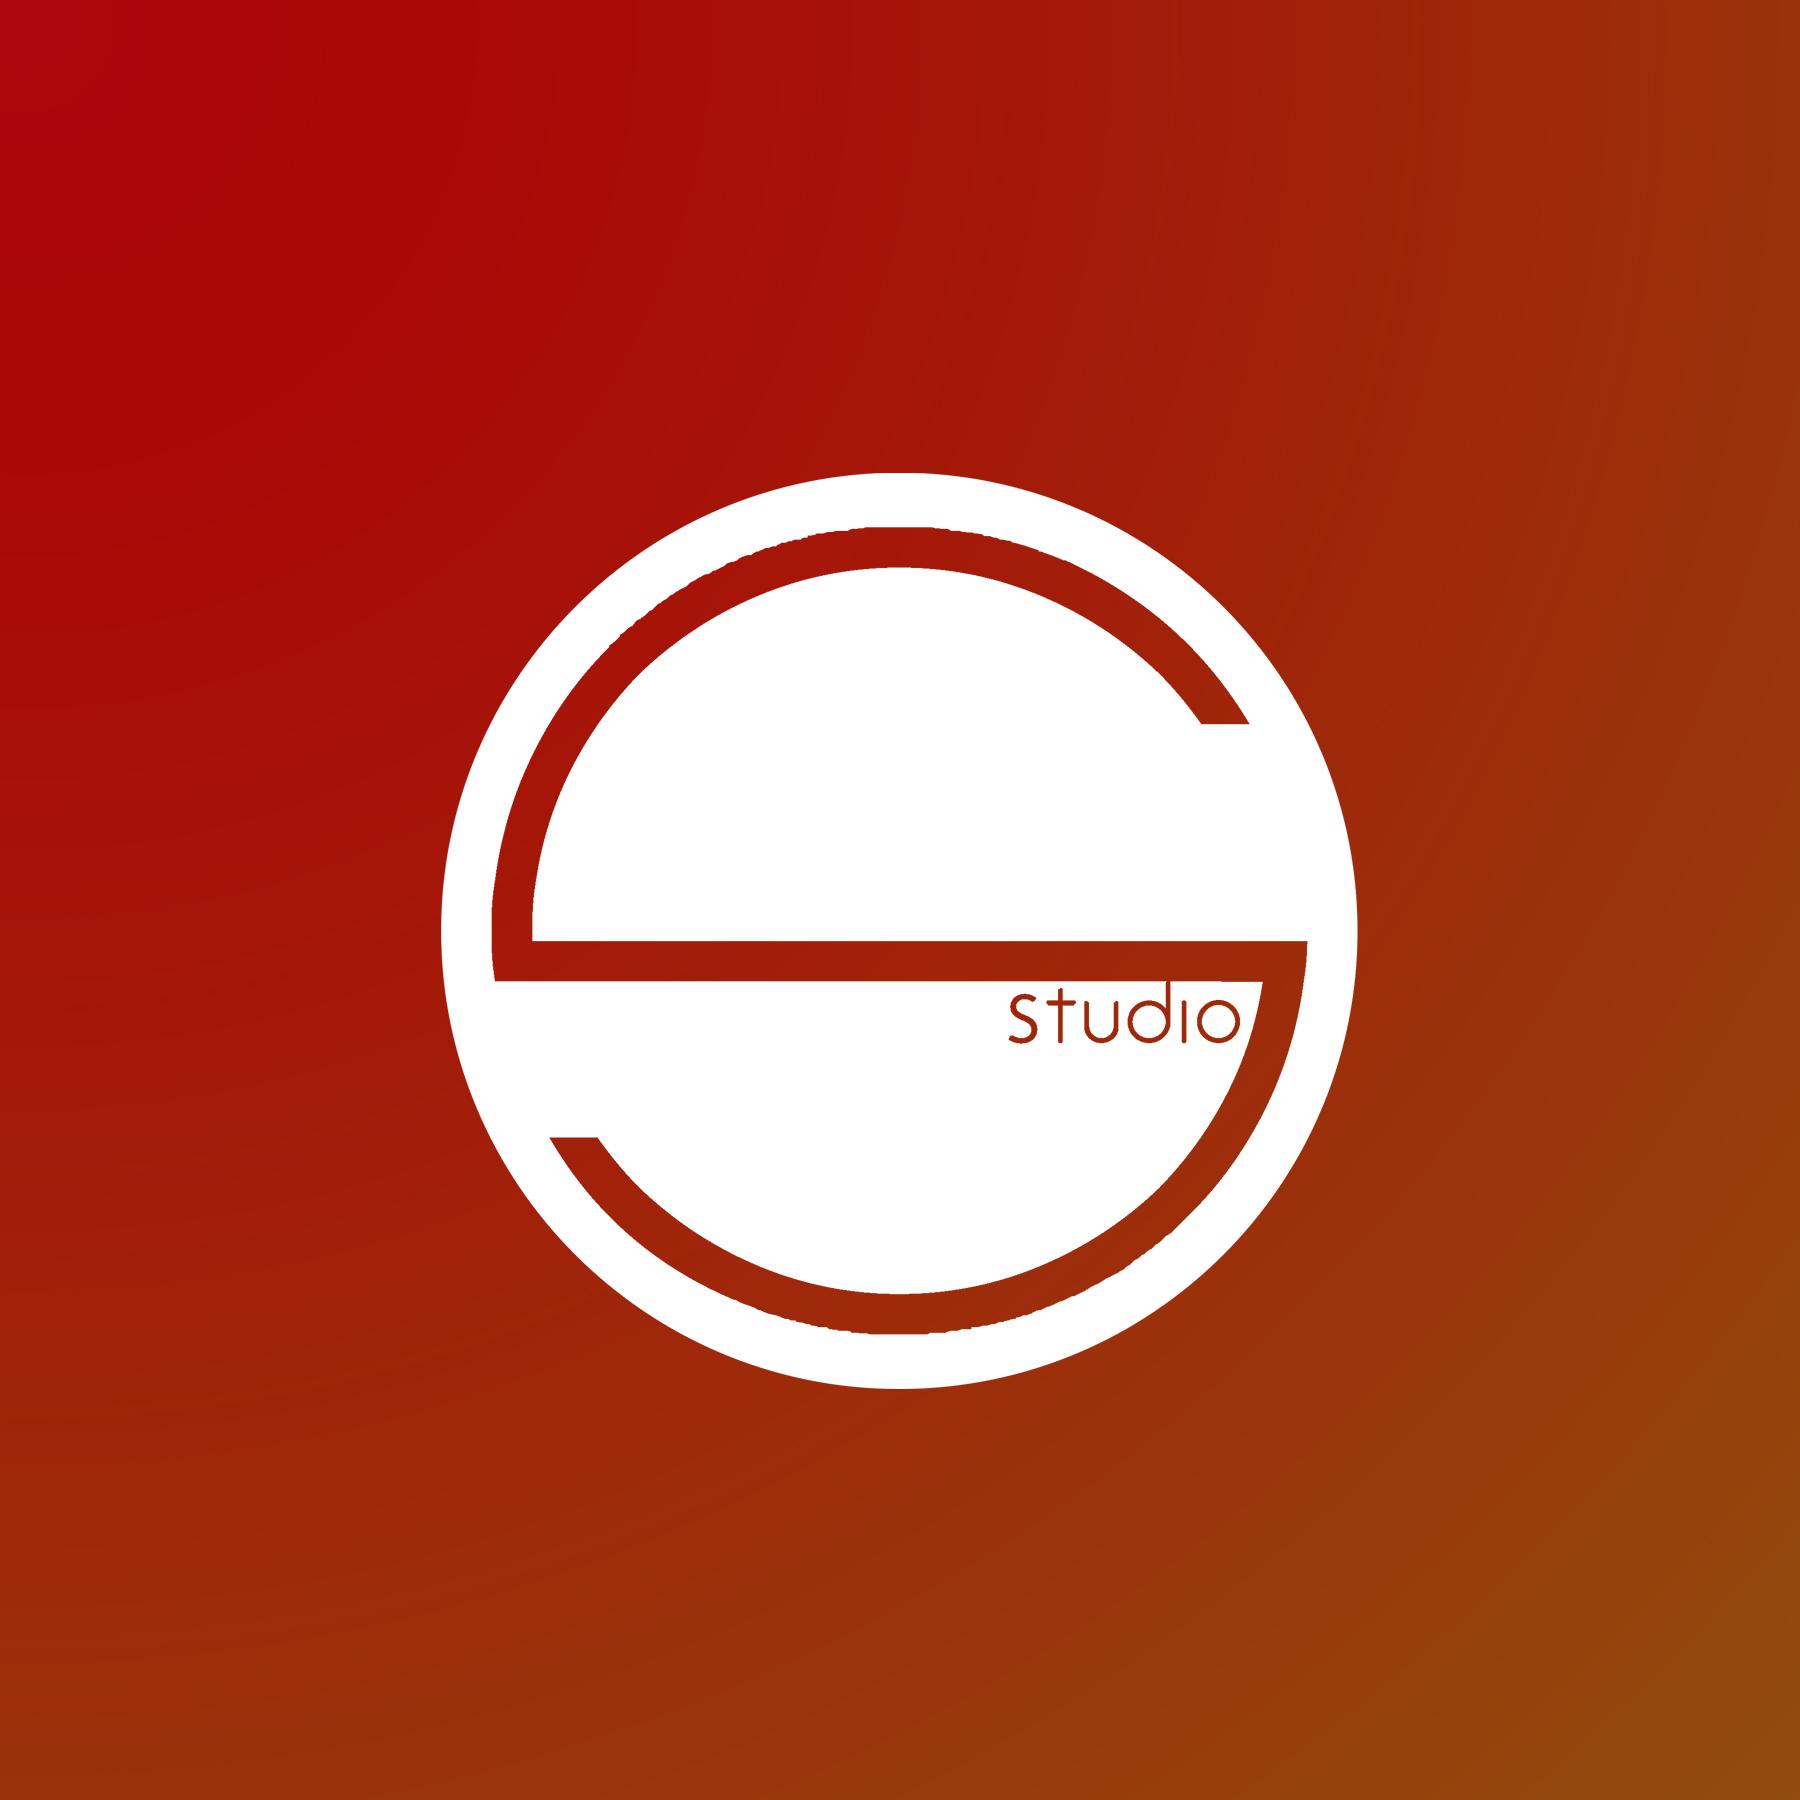 design 000044 sm G+ logo 0023.jpg